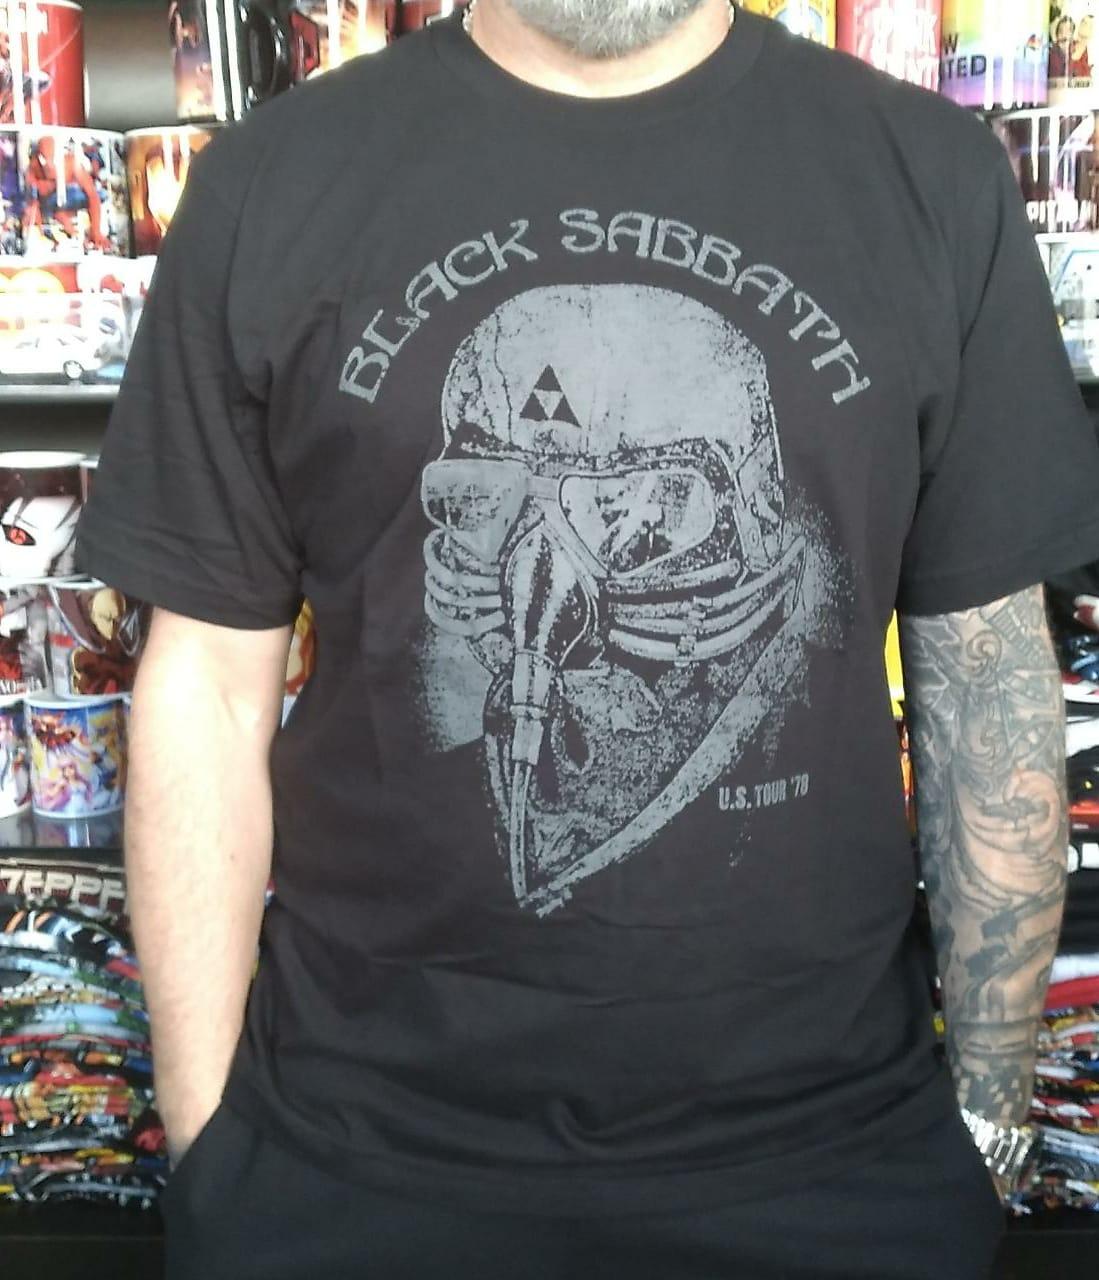 CAMISETA BLACK SABBATH TOUR'78